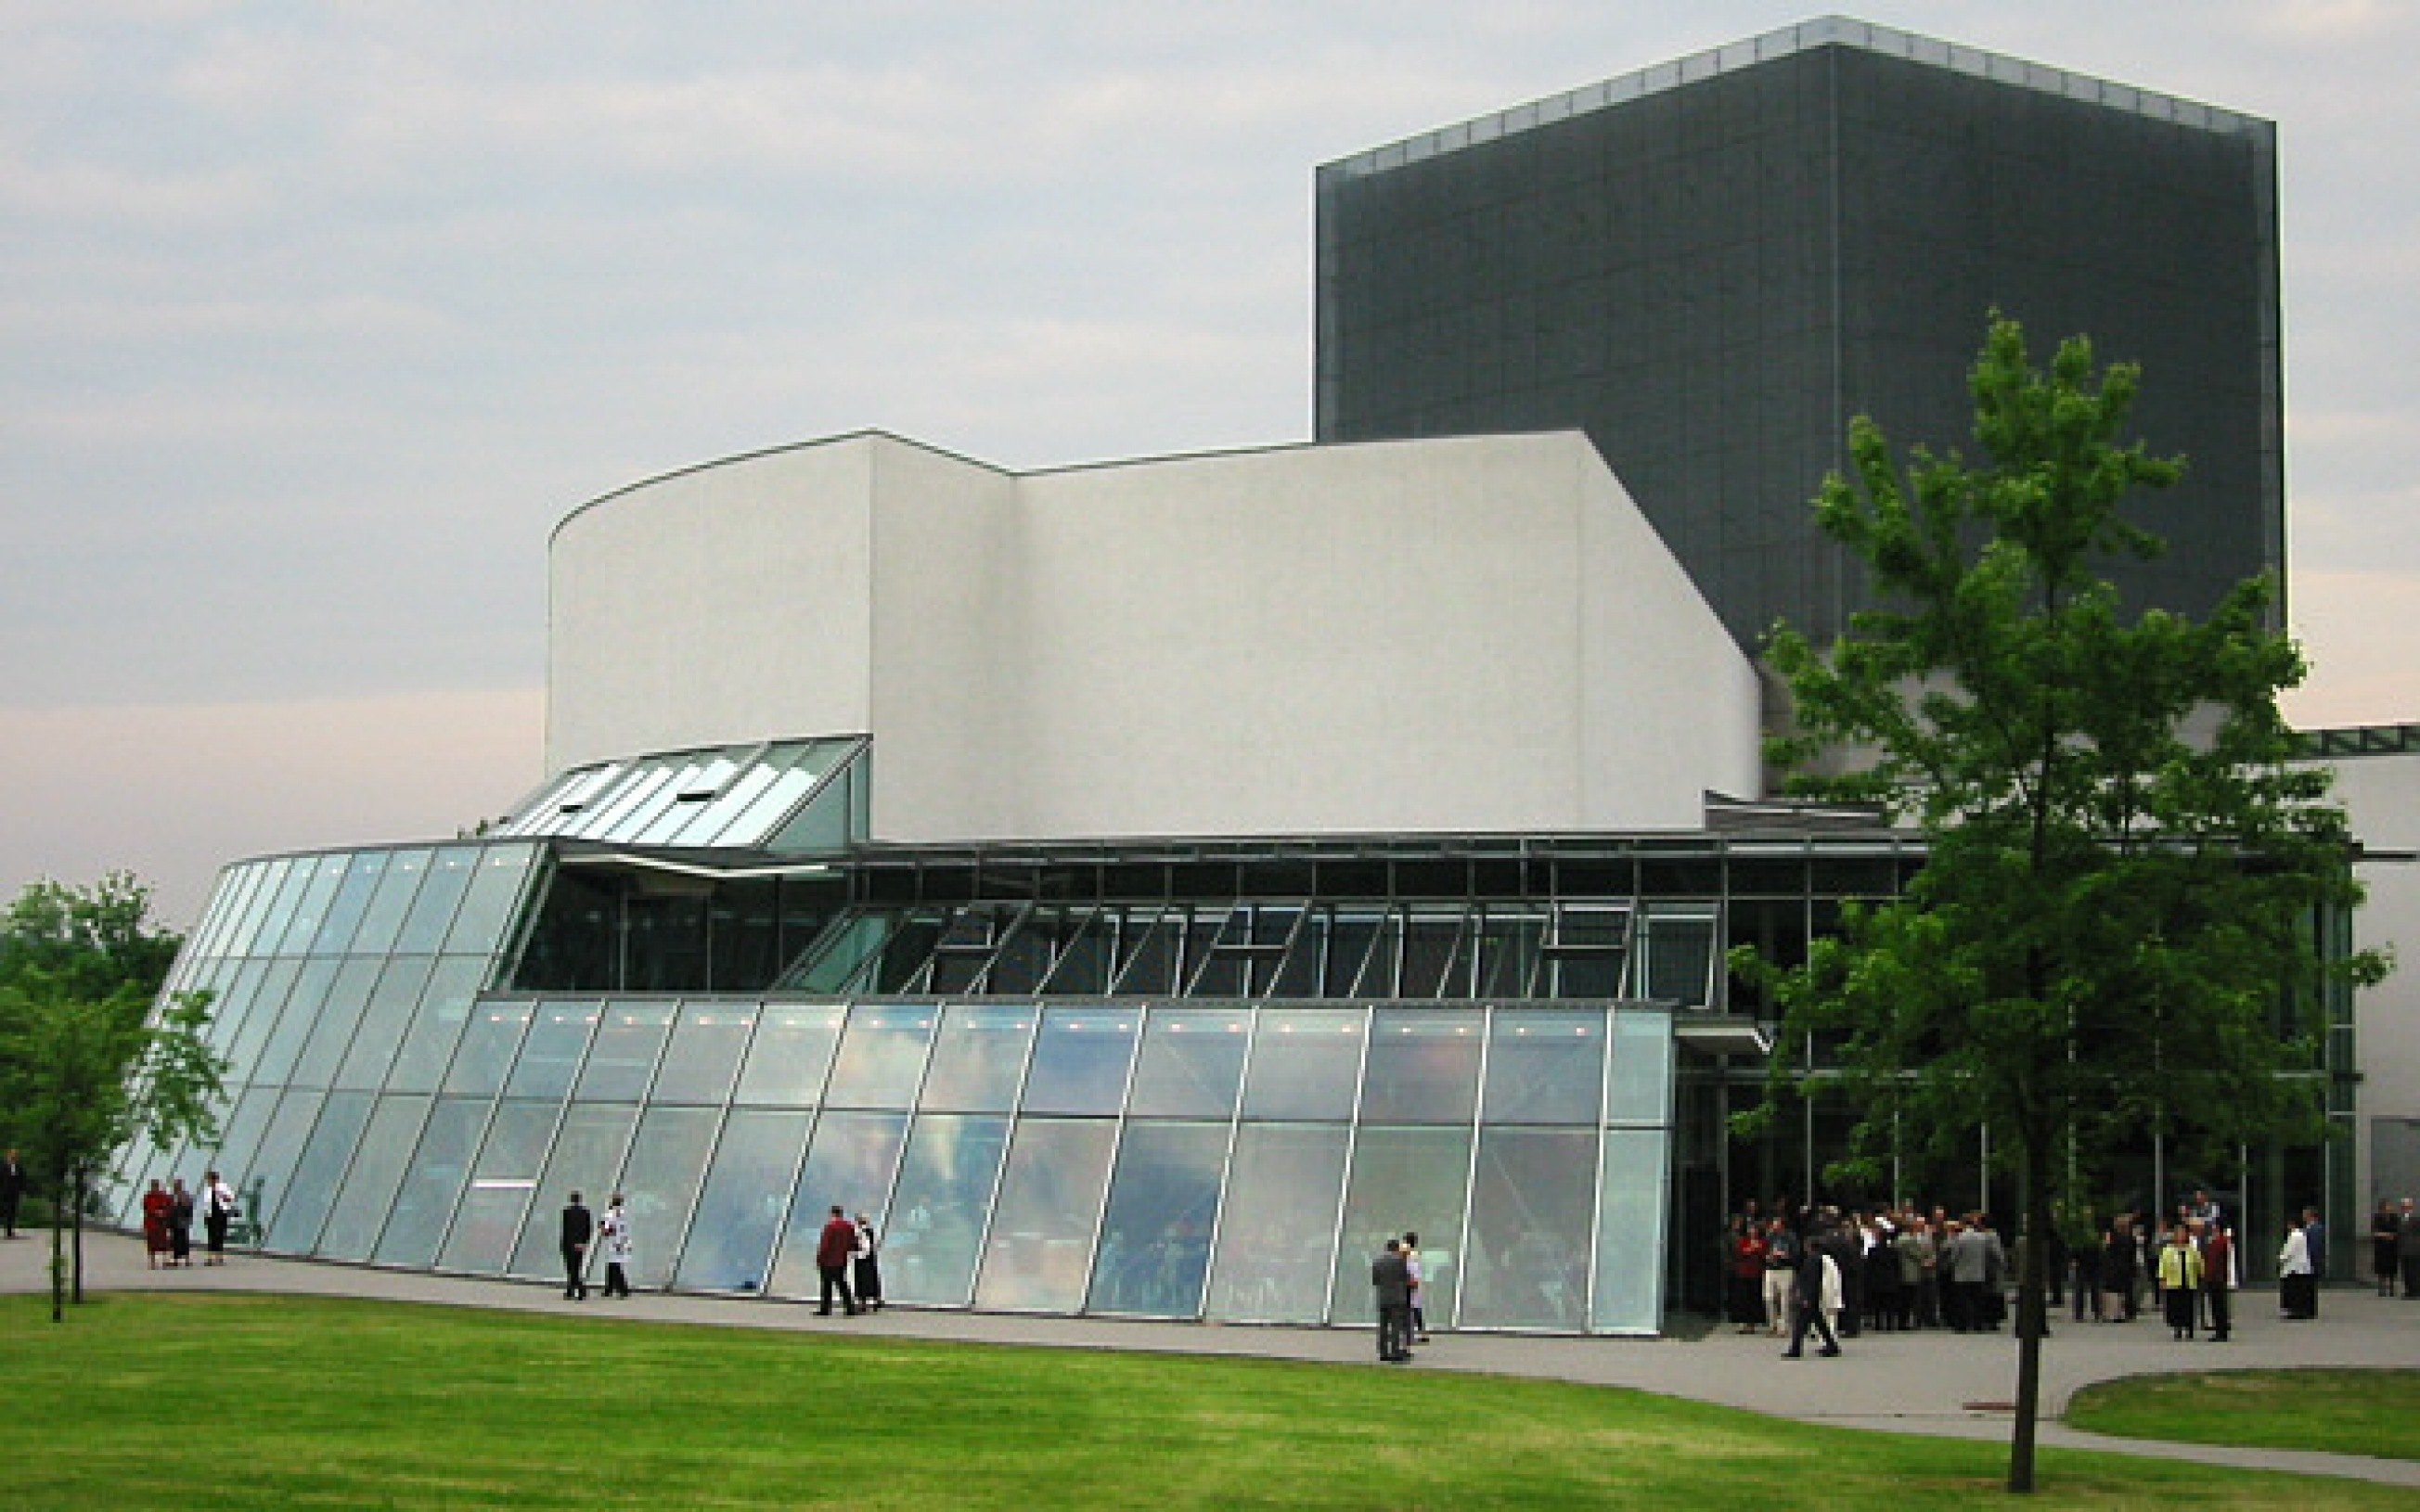 Hof, Bavaria, Germany: Theater